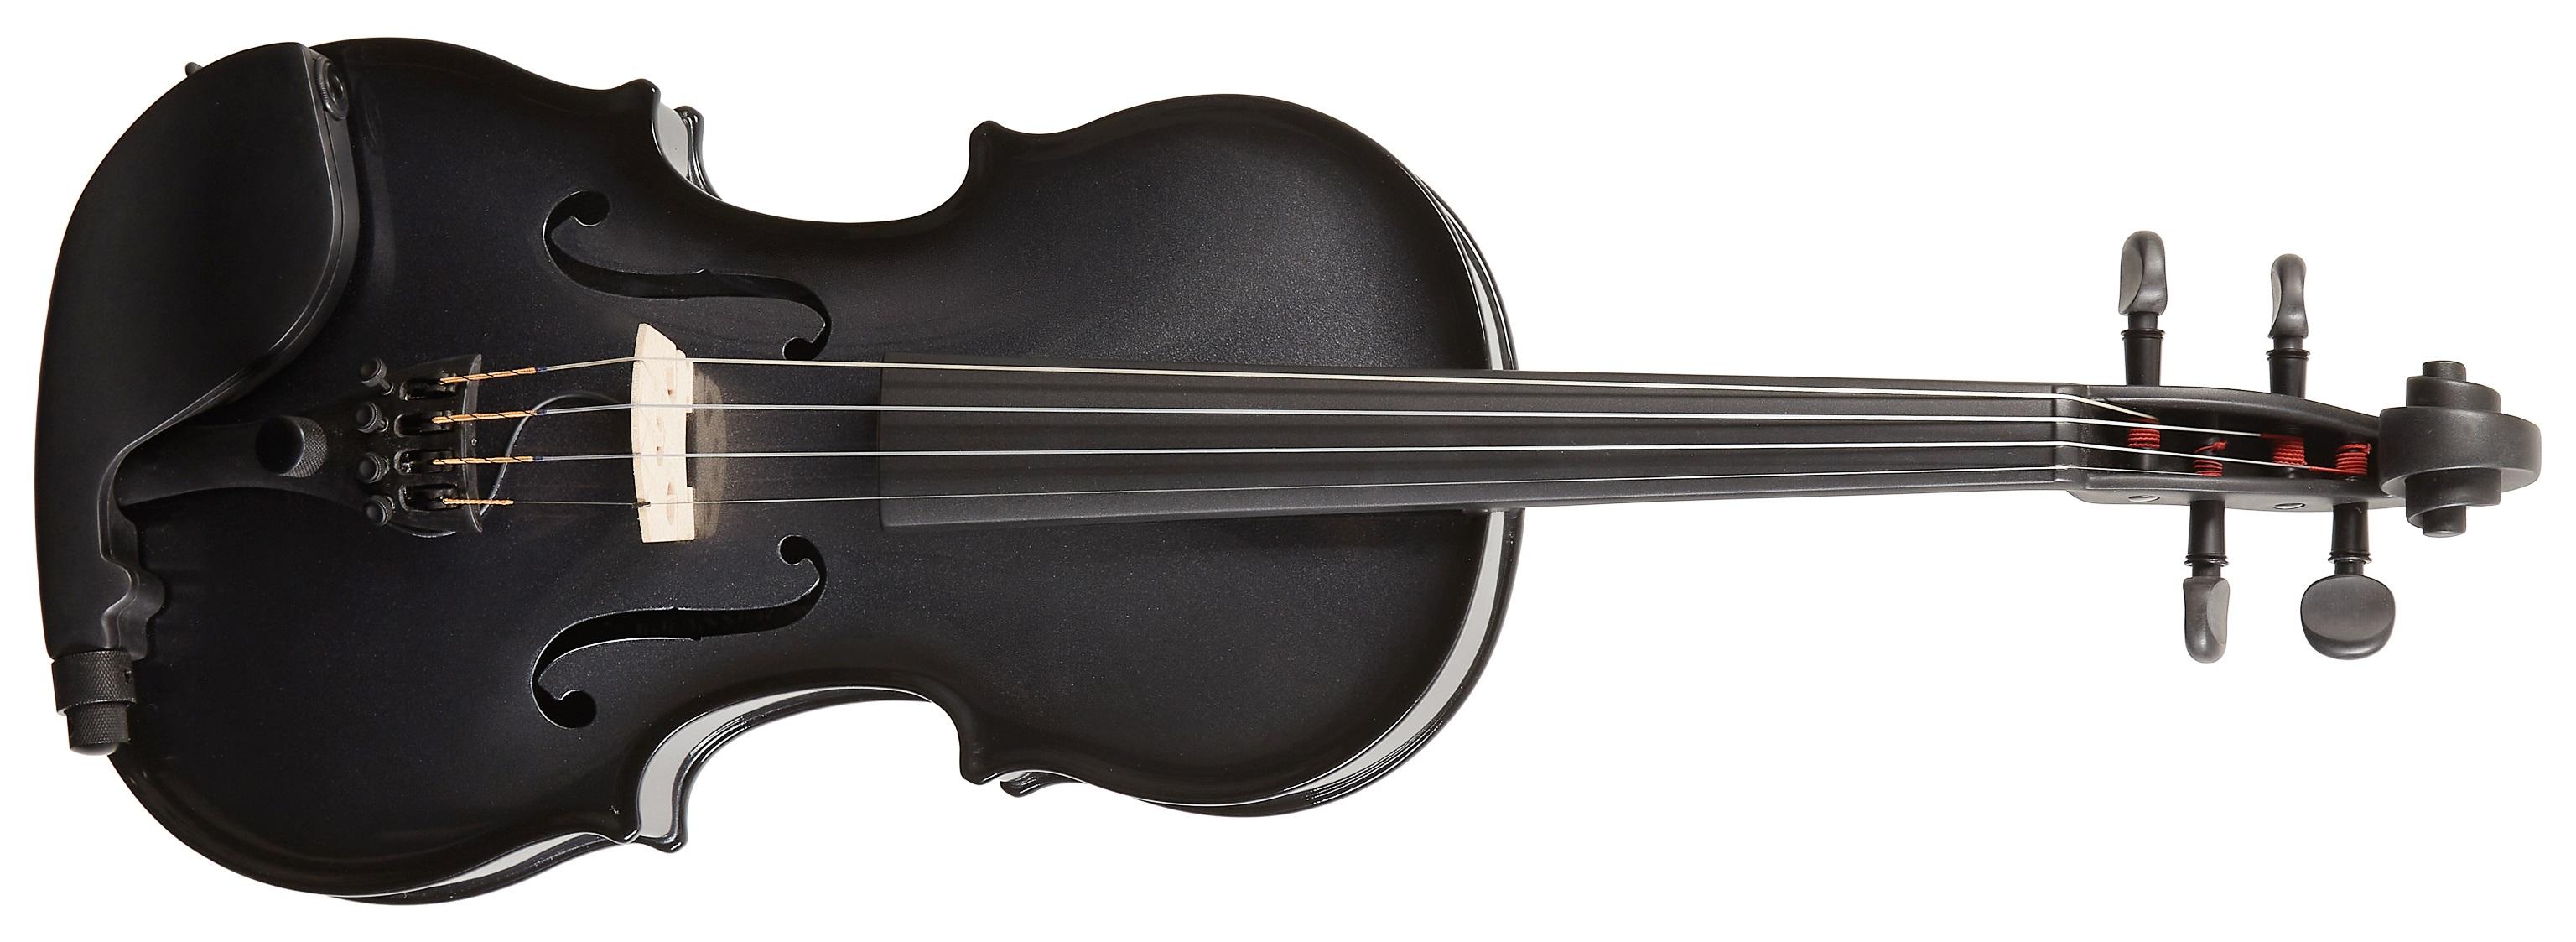 Glasser CC Violin AEX Acoustic Electric Gun Metal